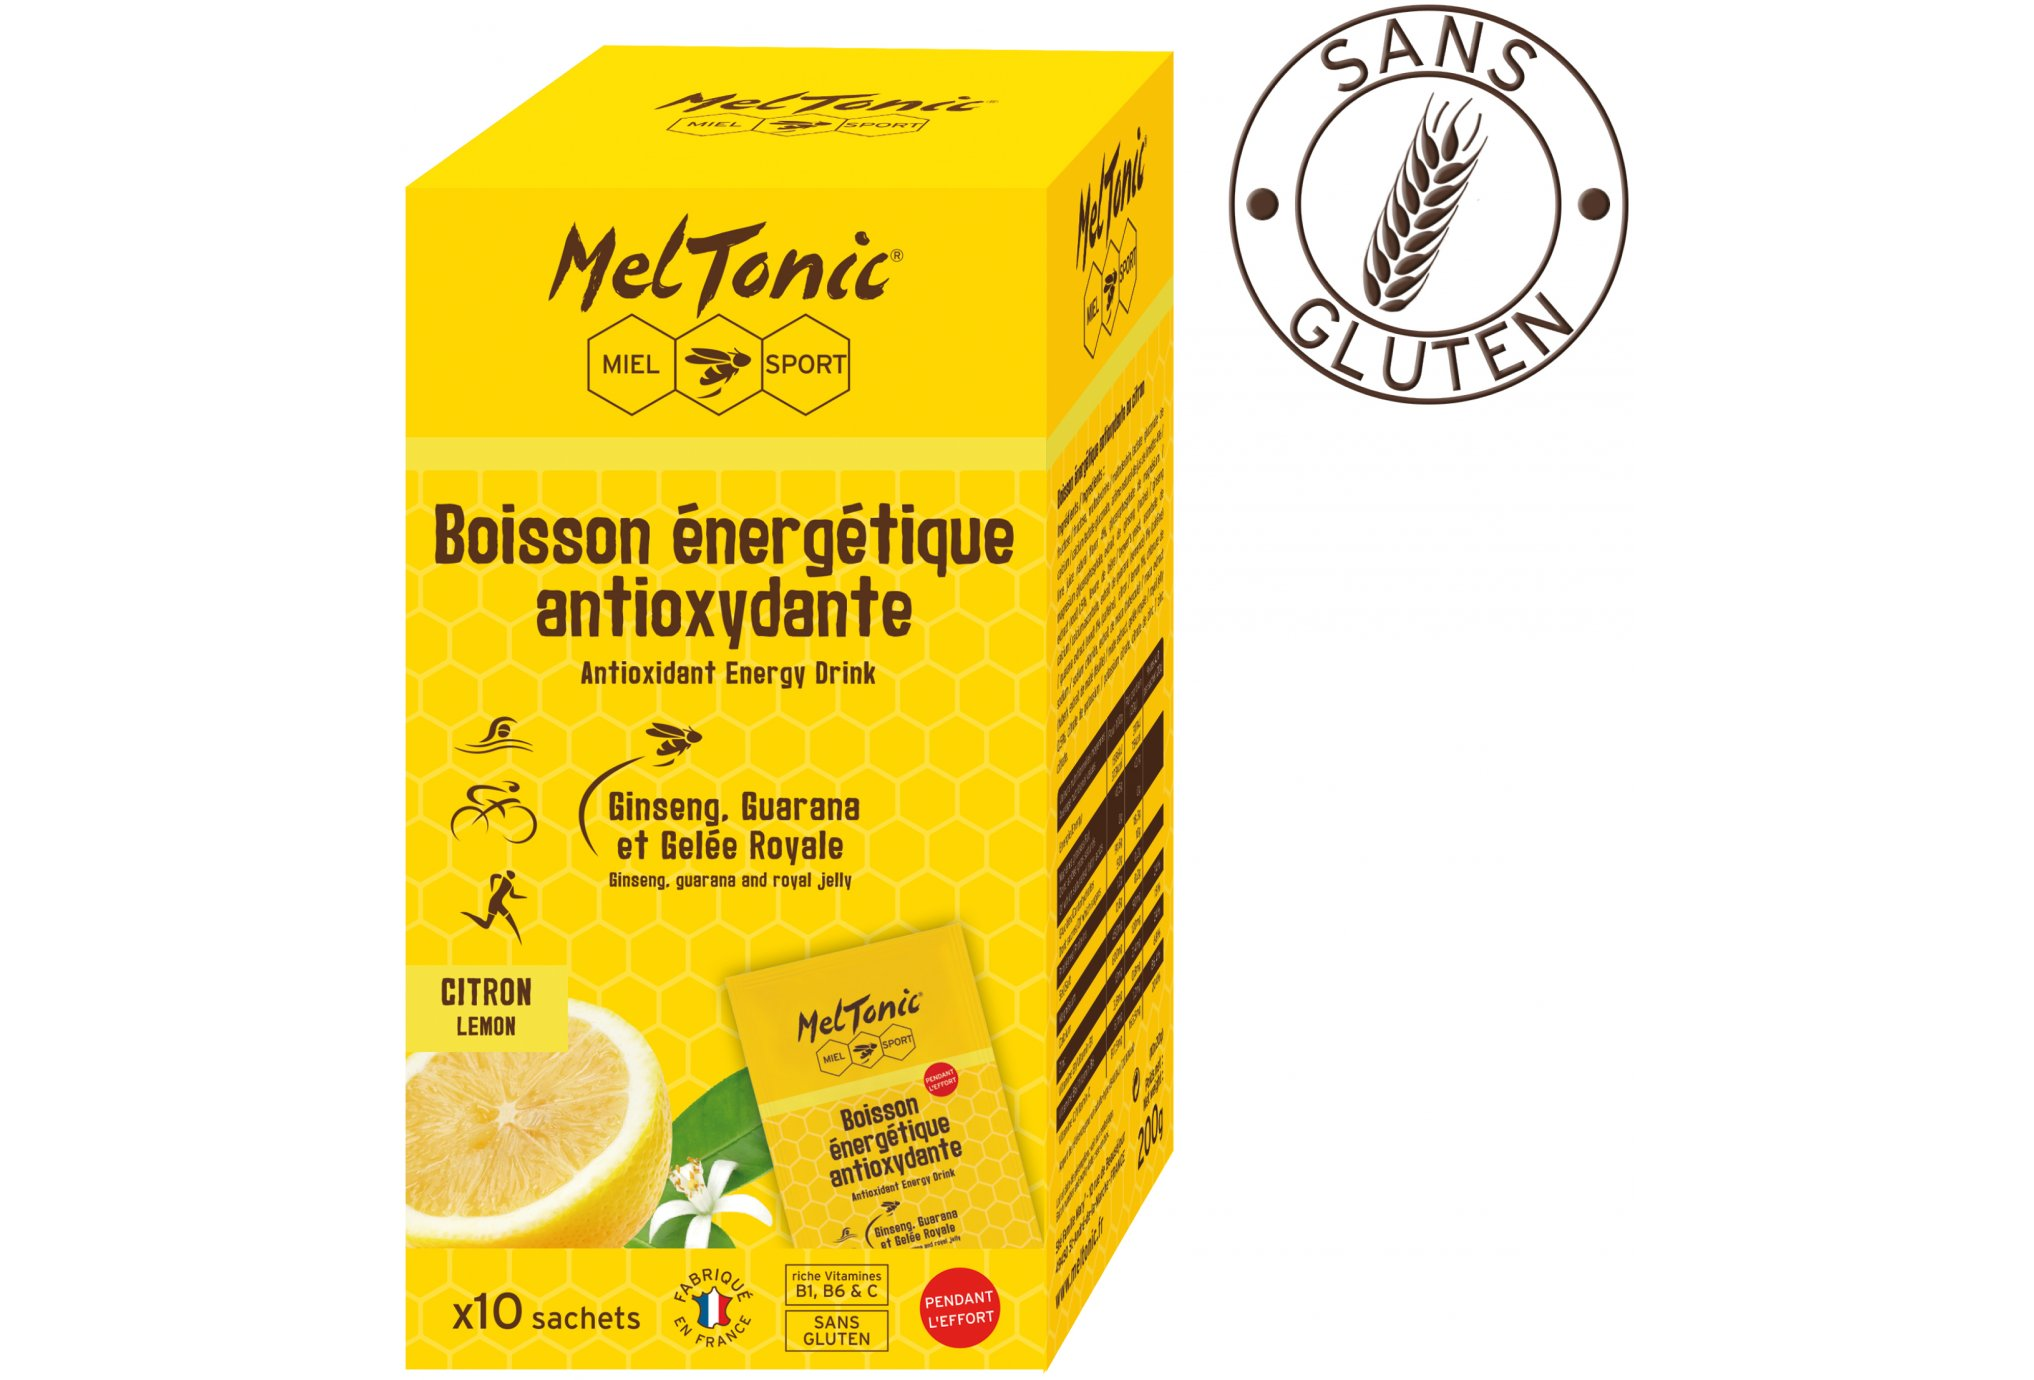 MelTonic Bebebida Energética Antioxidante- Limón Diététique Boissons